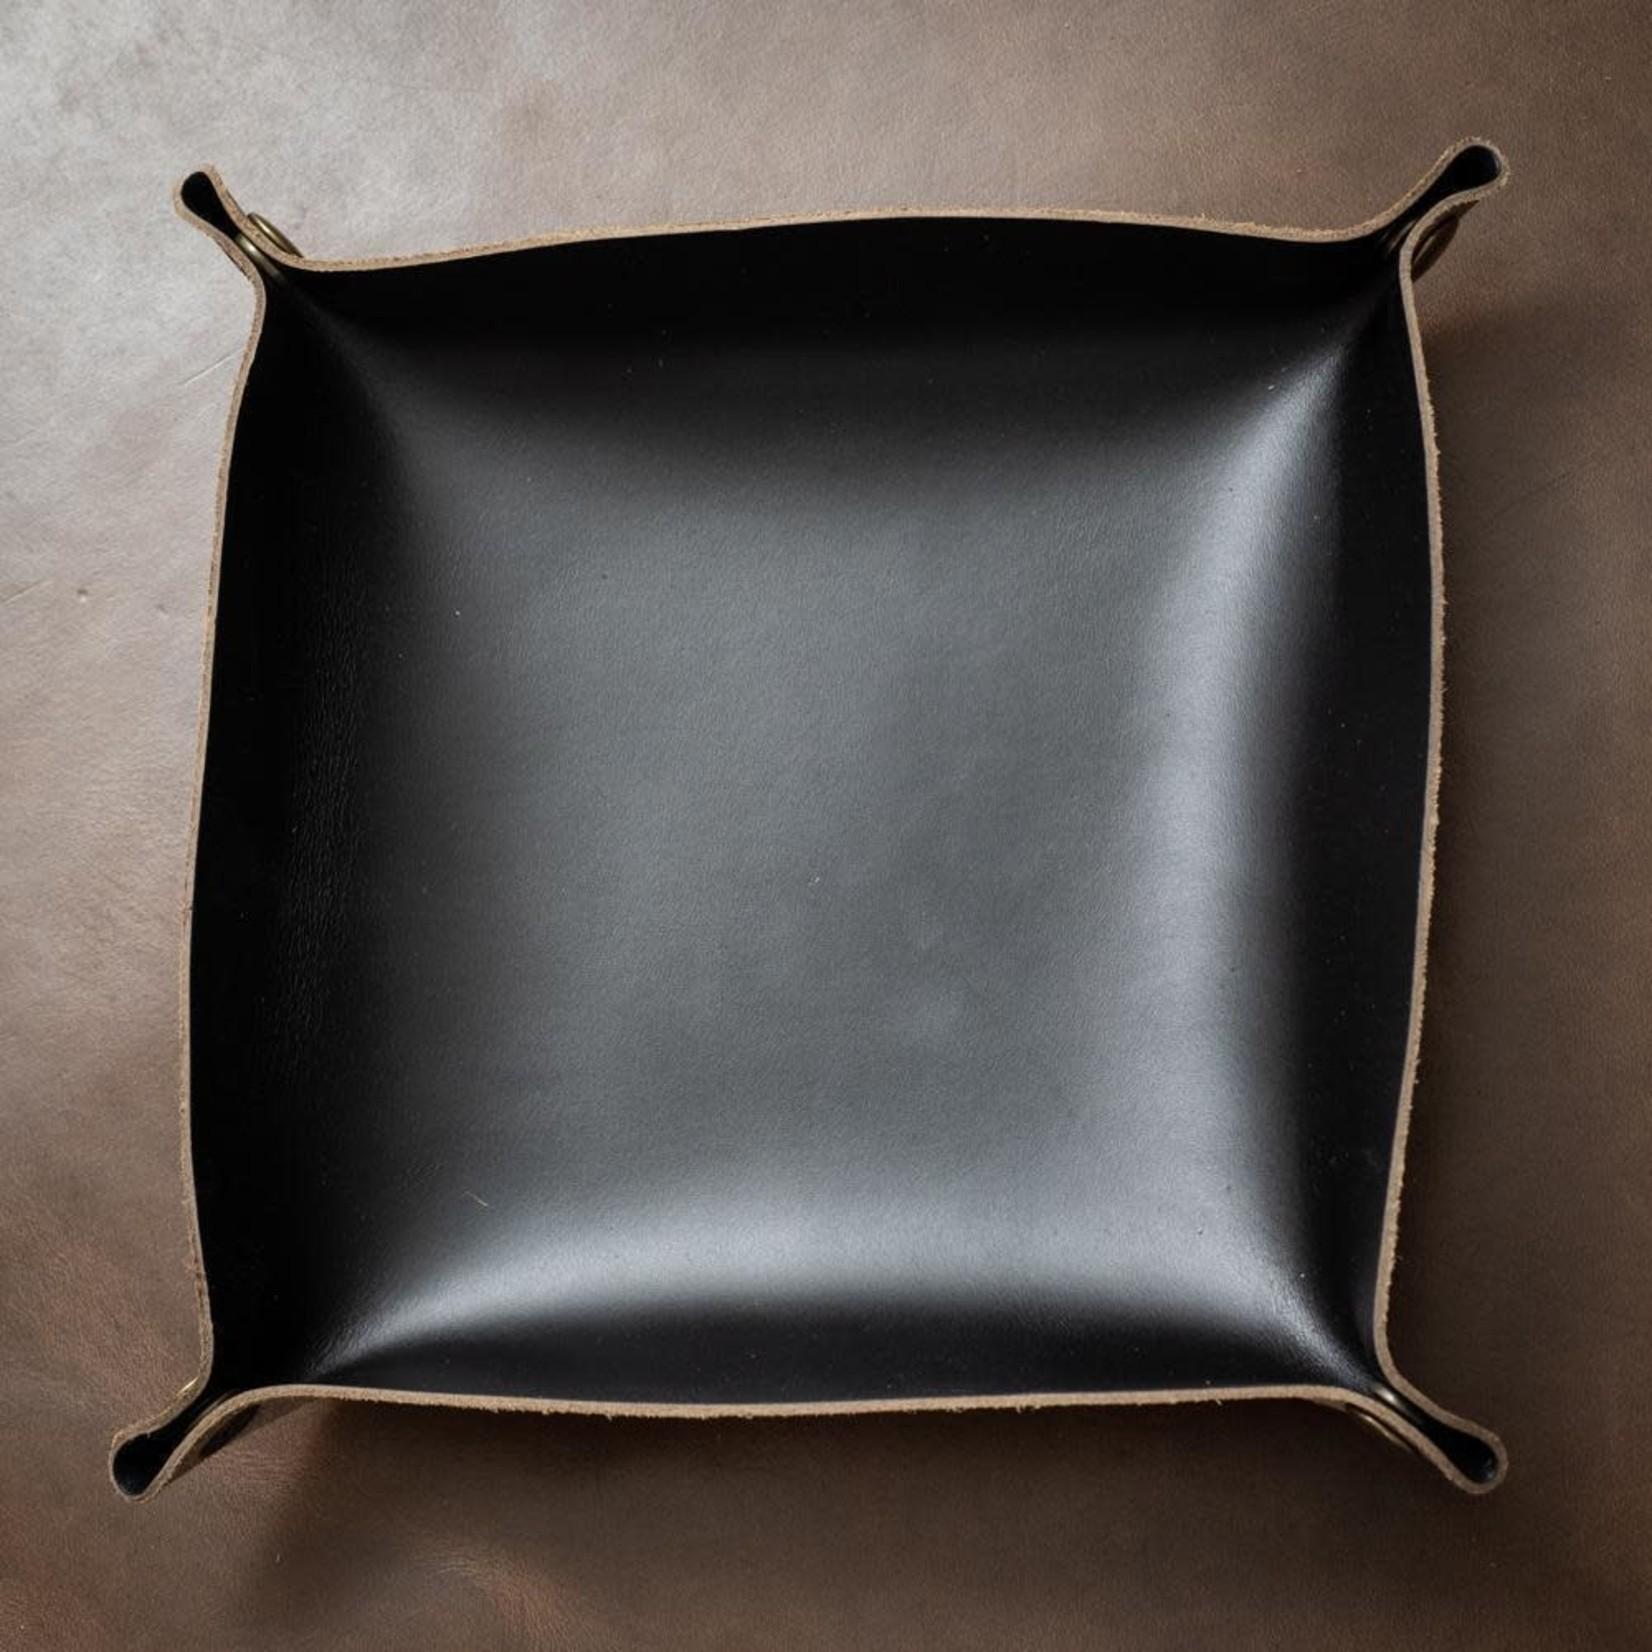 Popov Leather Popov Leather Valet Tray Black